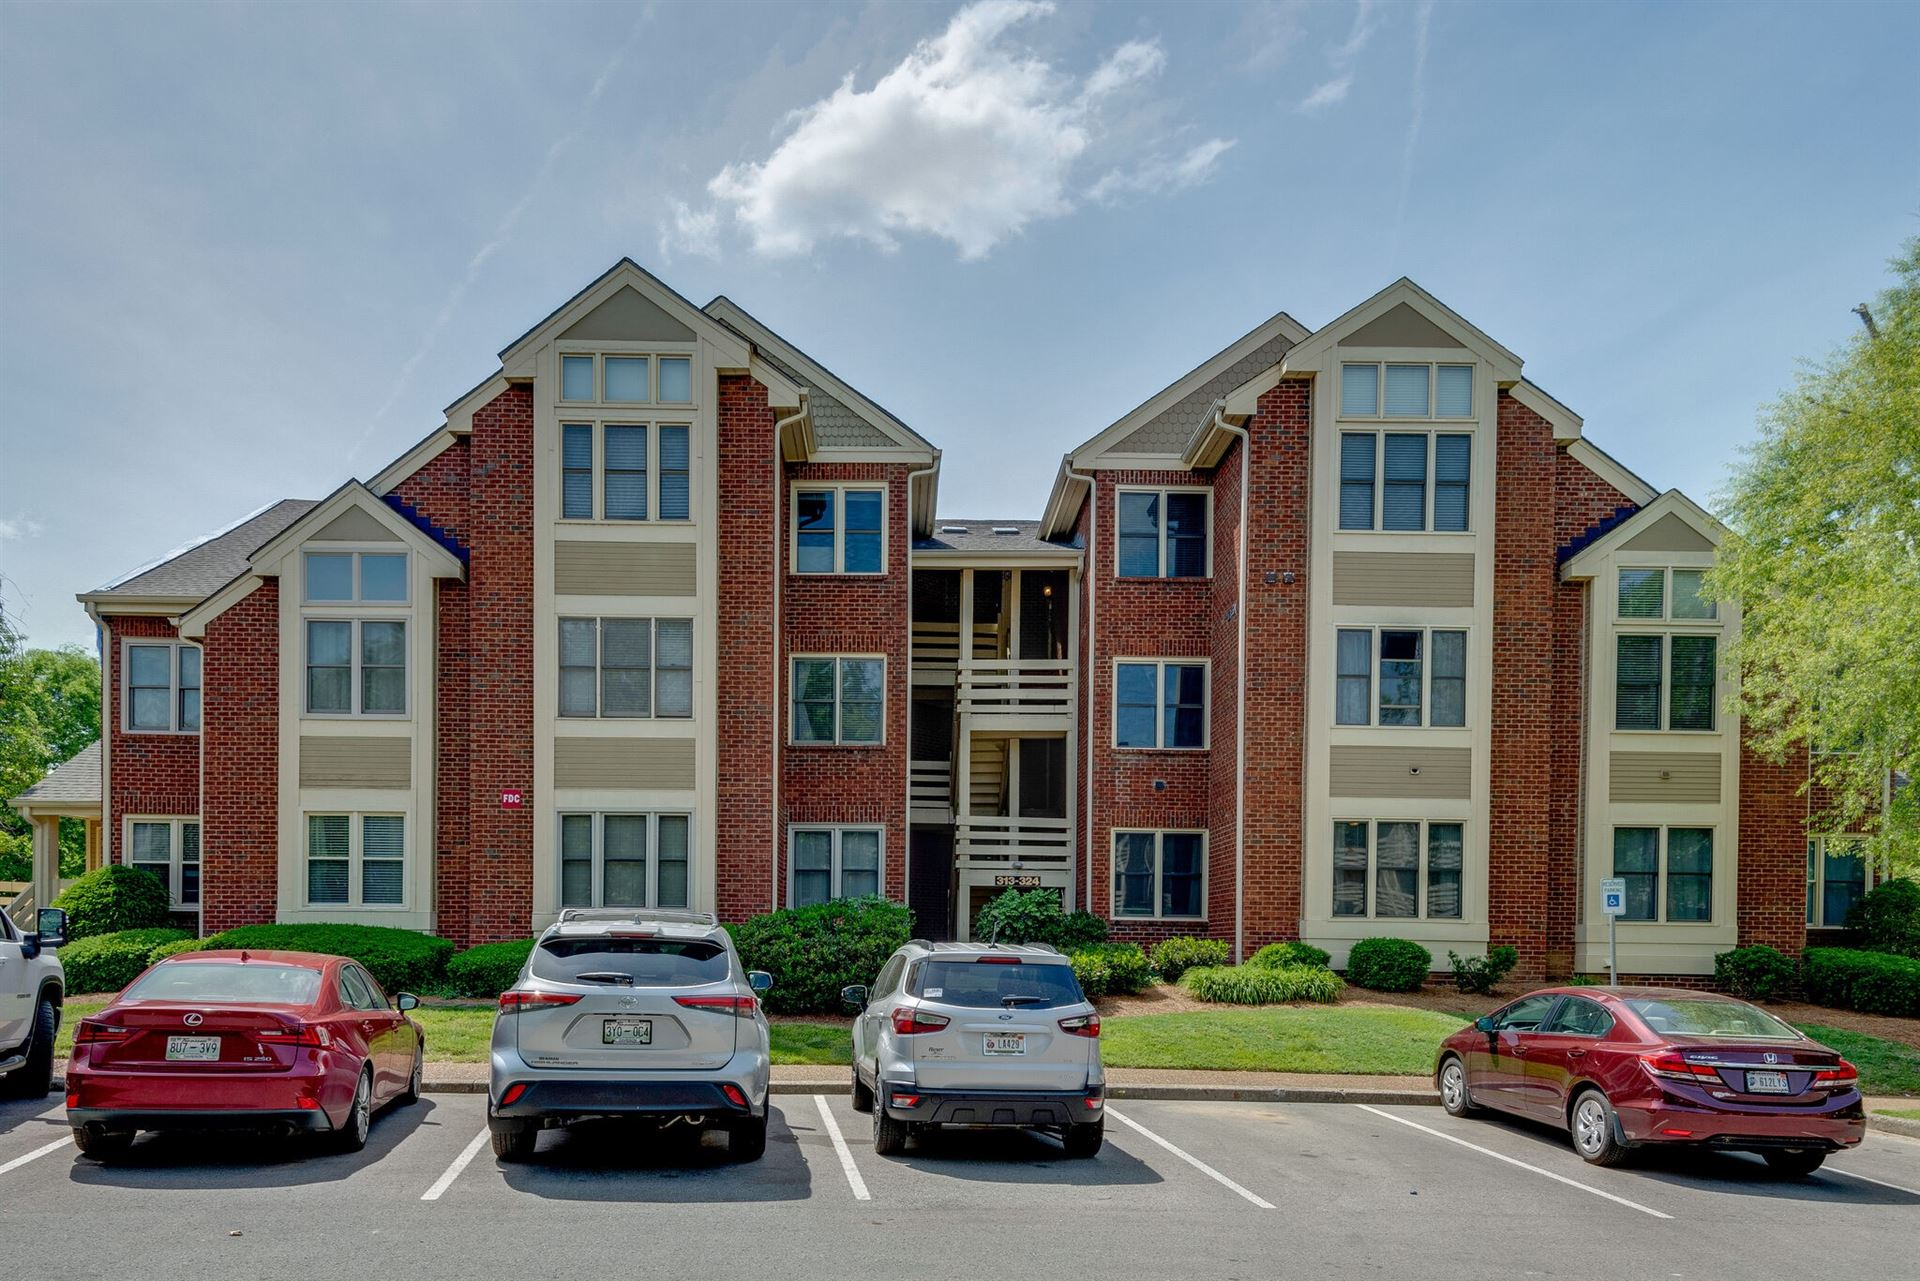 Photo of 317 Boxmere Pl, Nashville, TN 37215 (MLS # 2263150)